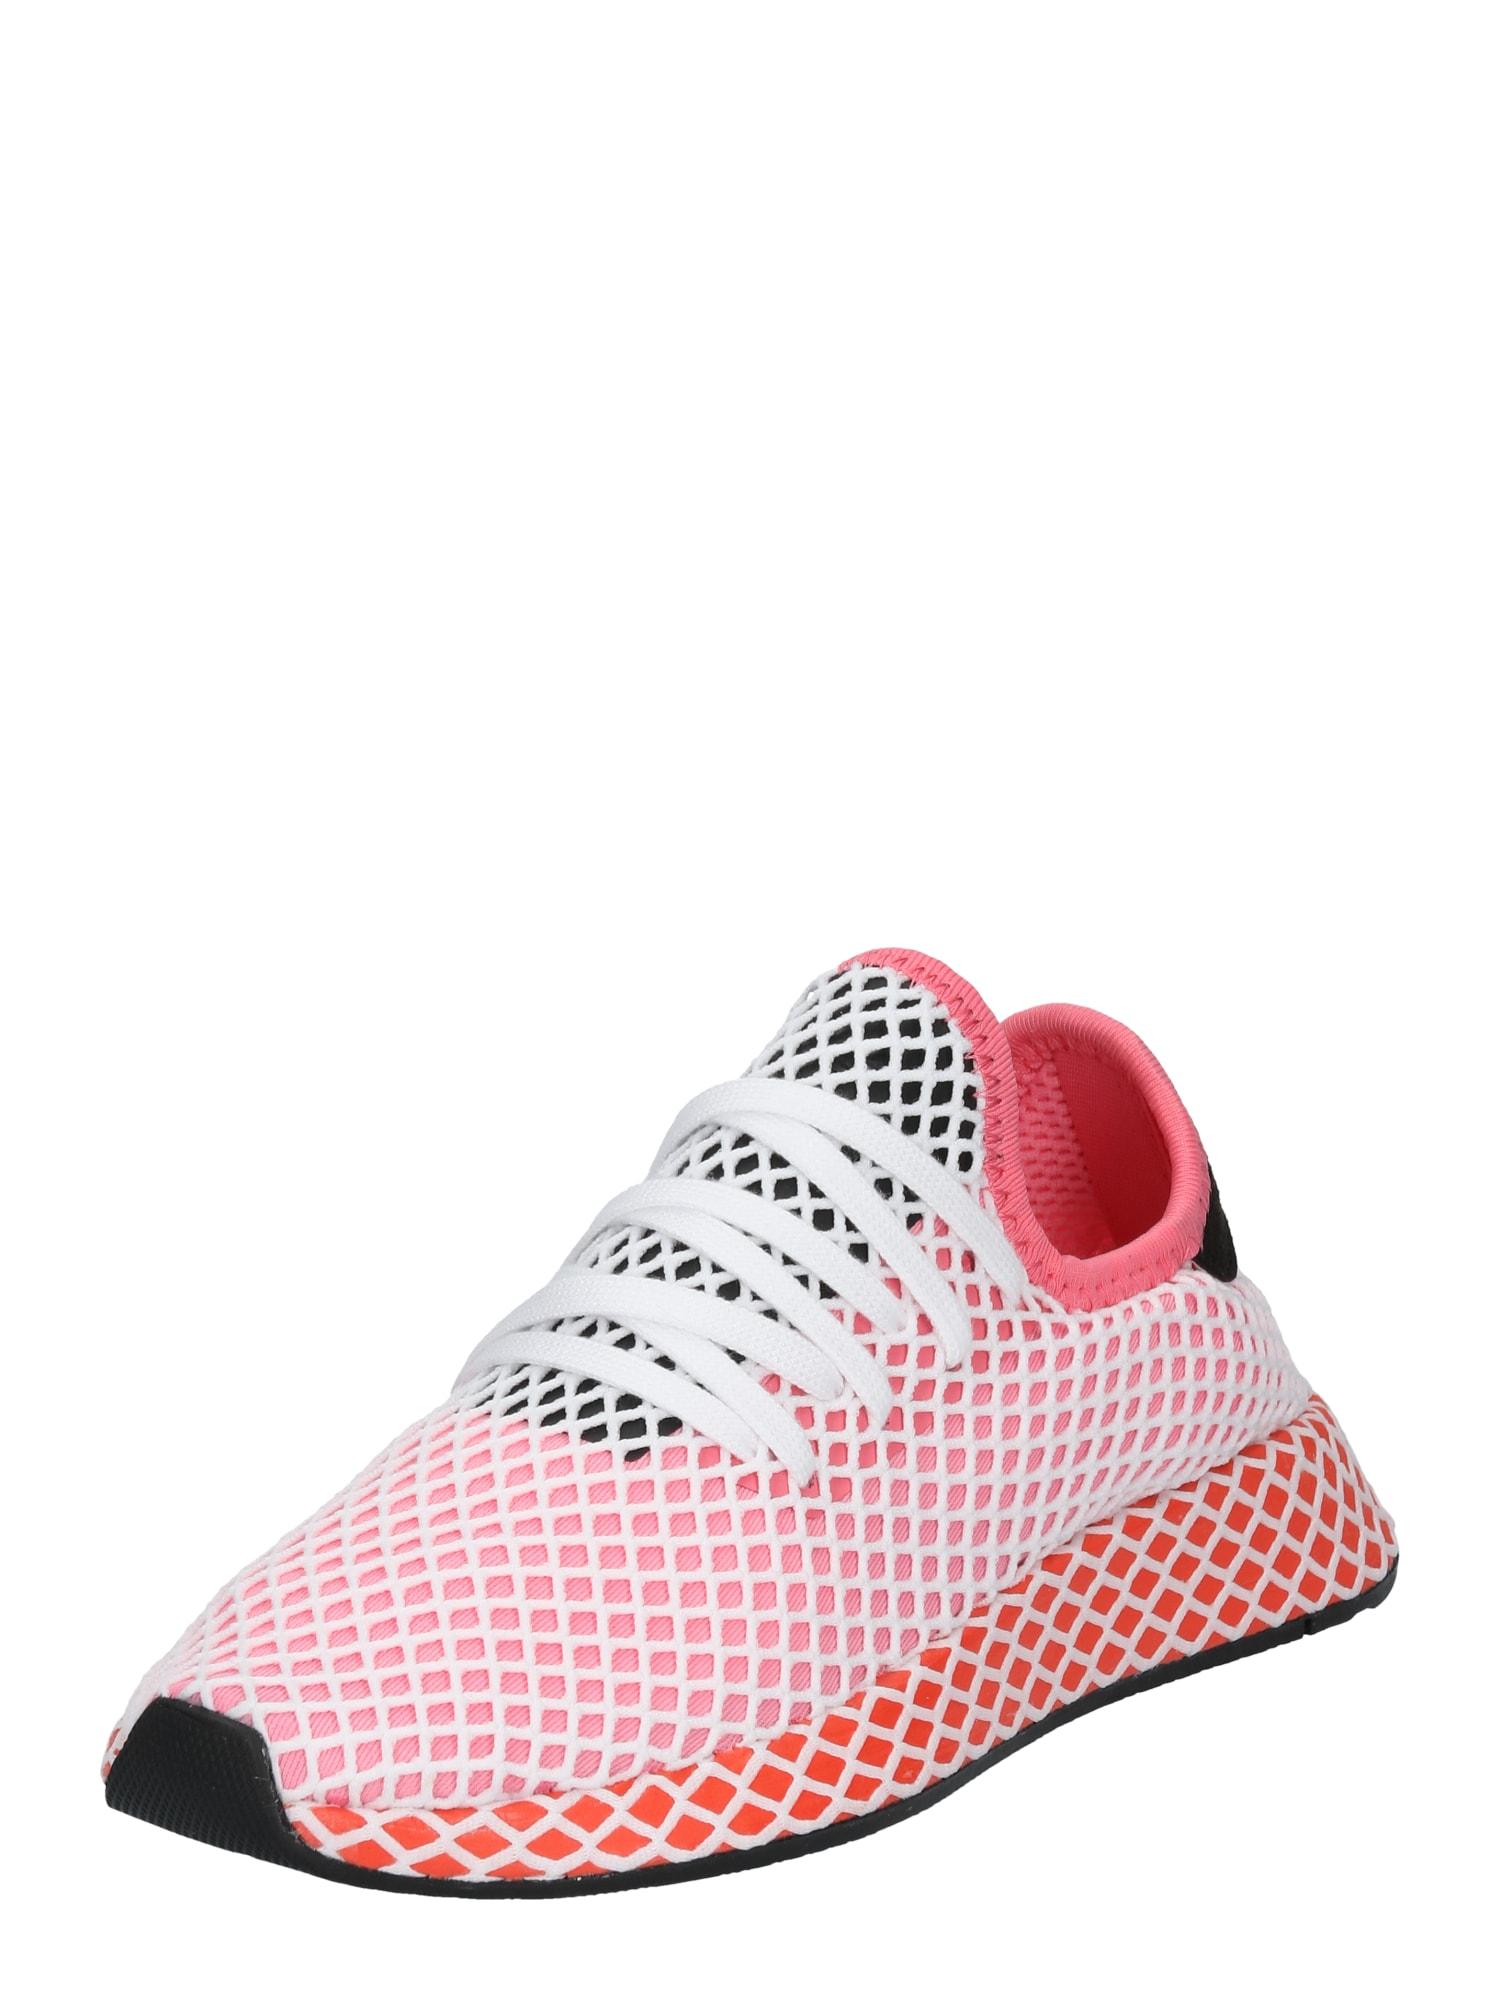 ADIDAS ORIGINALS, Dames Sneakers laag 'DEERUPT RUNNER', rosa